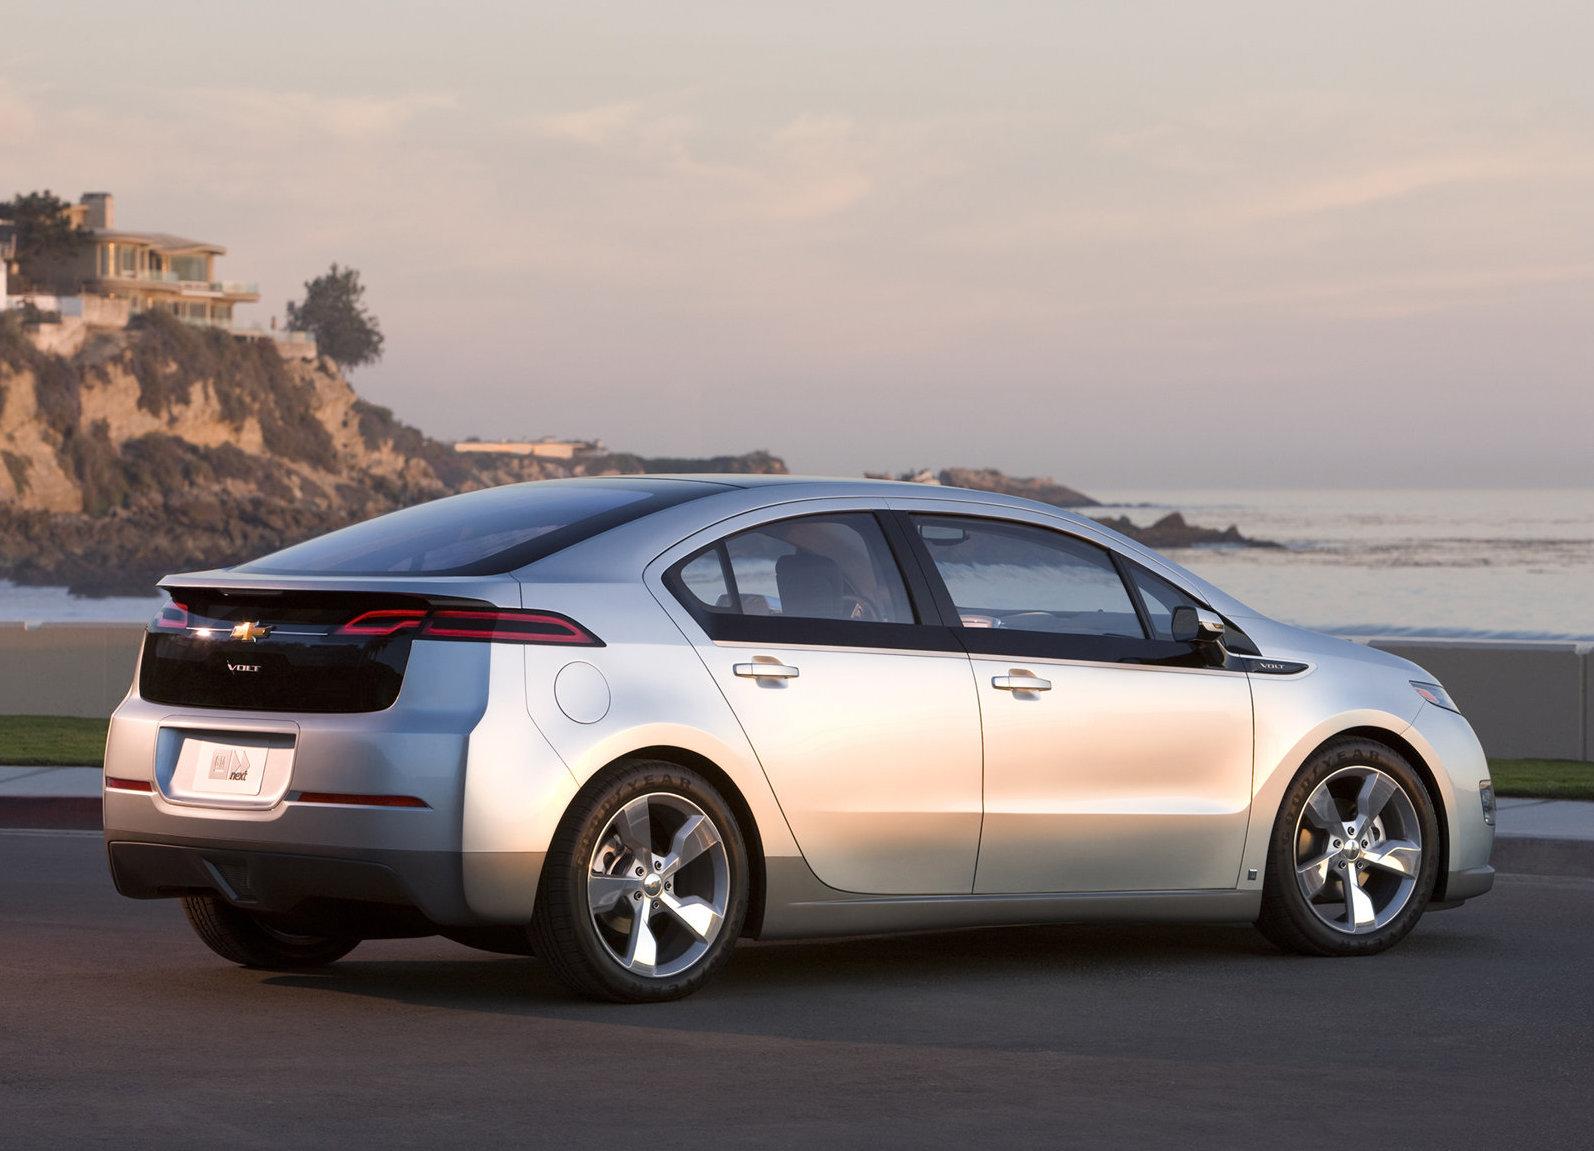 2011 Chevrolet Volt Rear 3/4